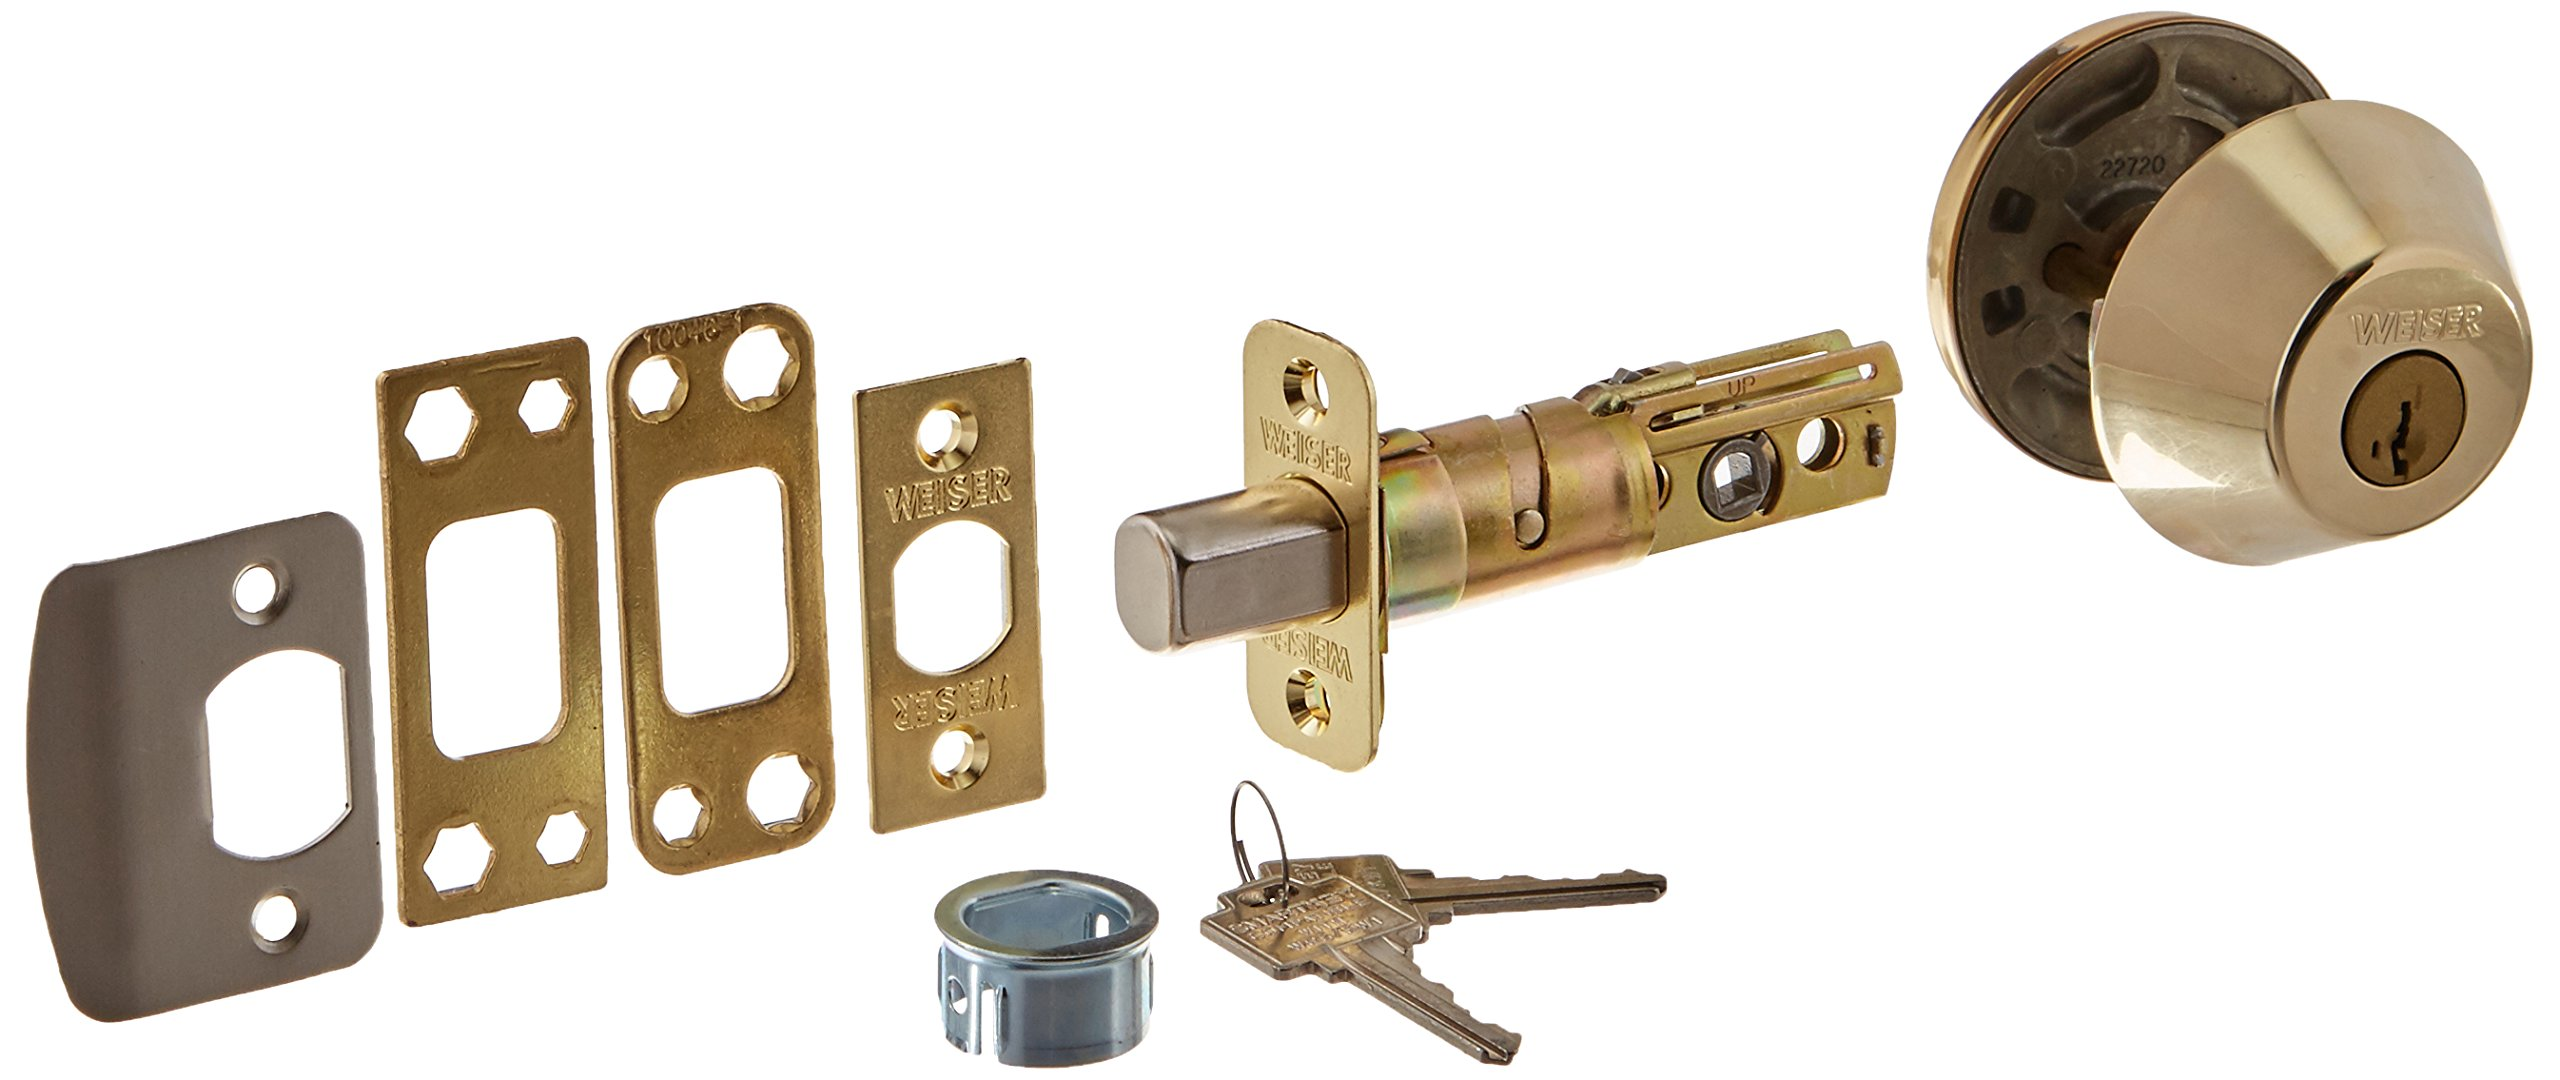 WEISER LOCK GD9471X 3 SMT K4 MS RLR2 Single Cylinder Deadbolt, Bright Brass by Weiser